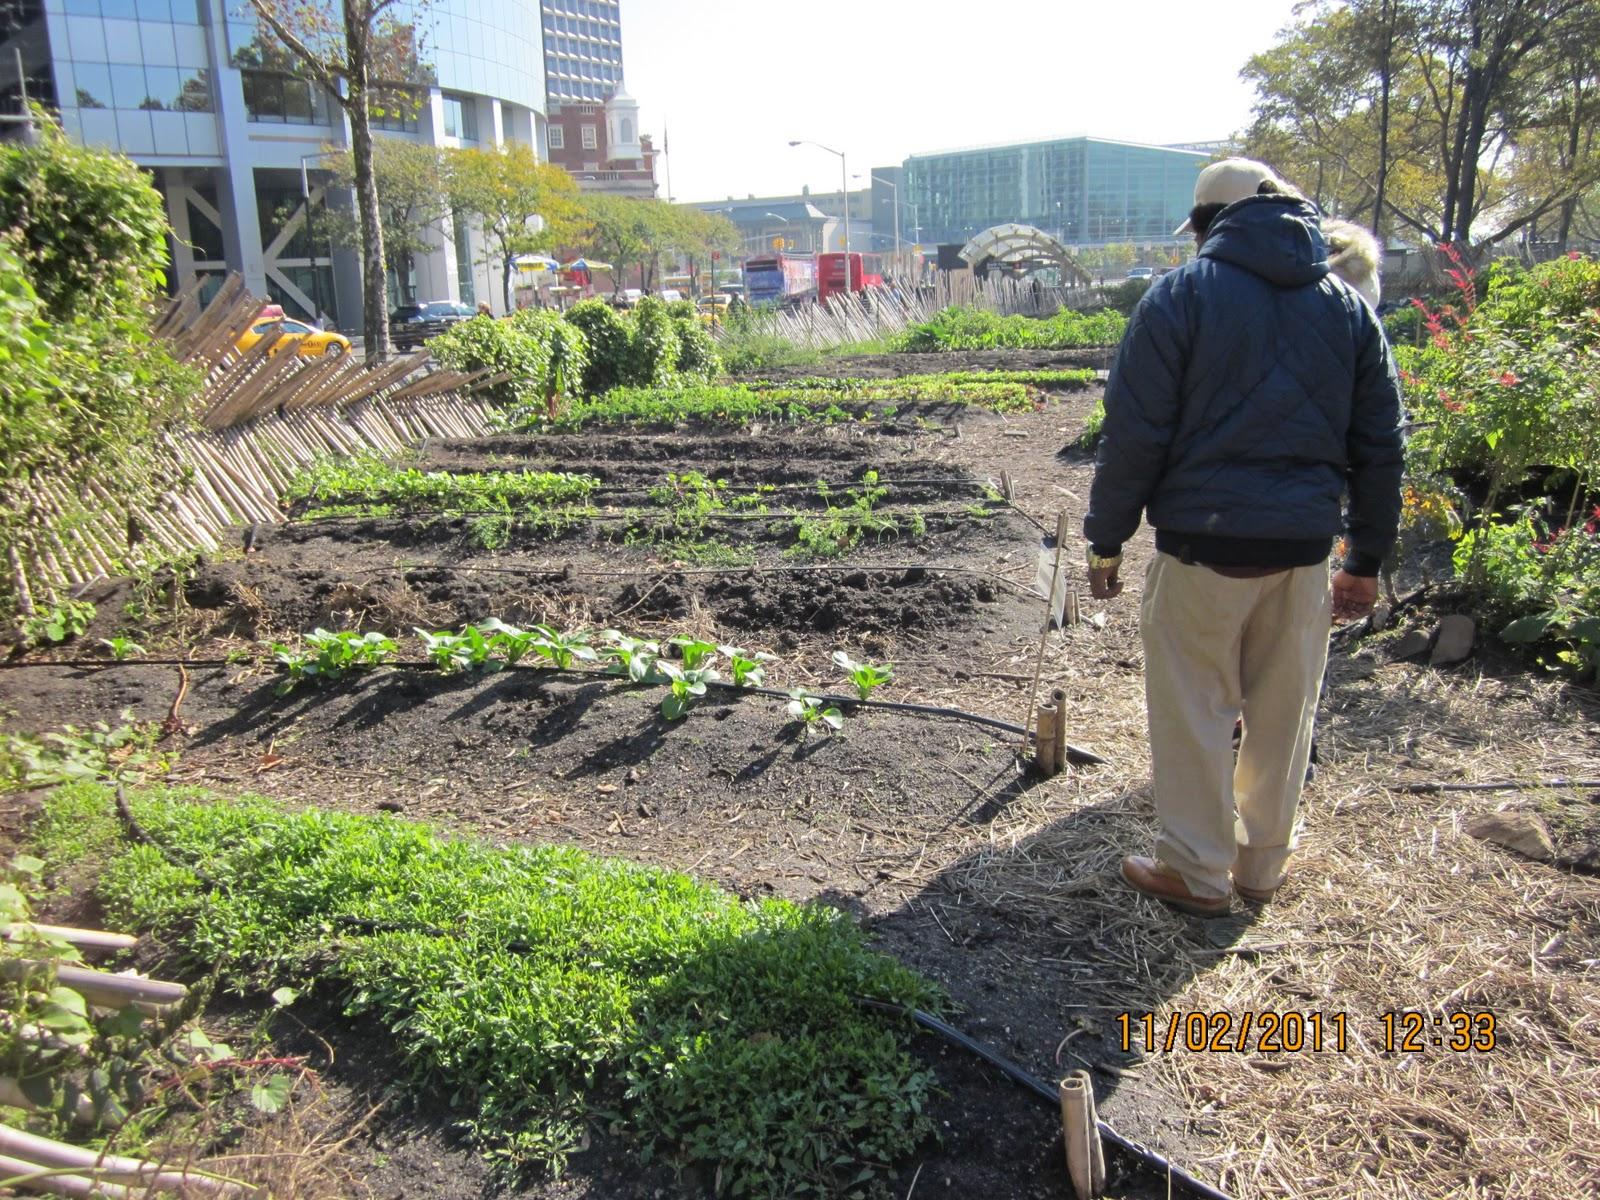 The Bridge Urban Farms Growing Food In The Bronx East Harlem Trip Tothe Battery Urban Farm